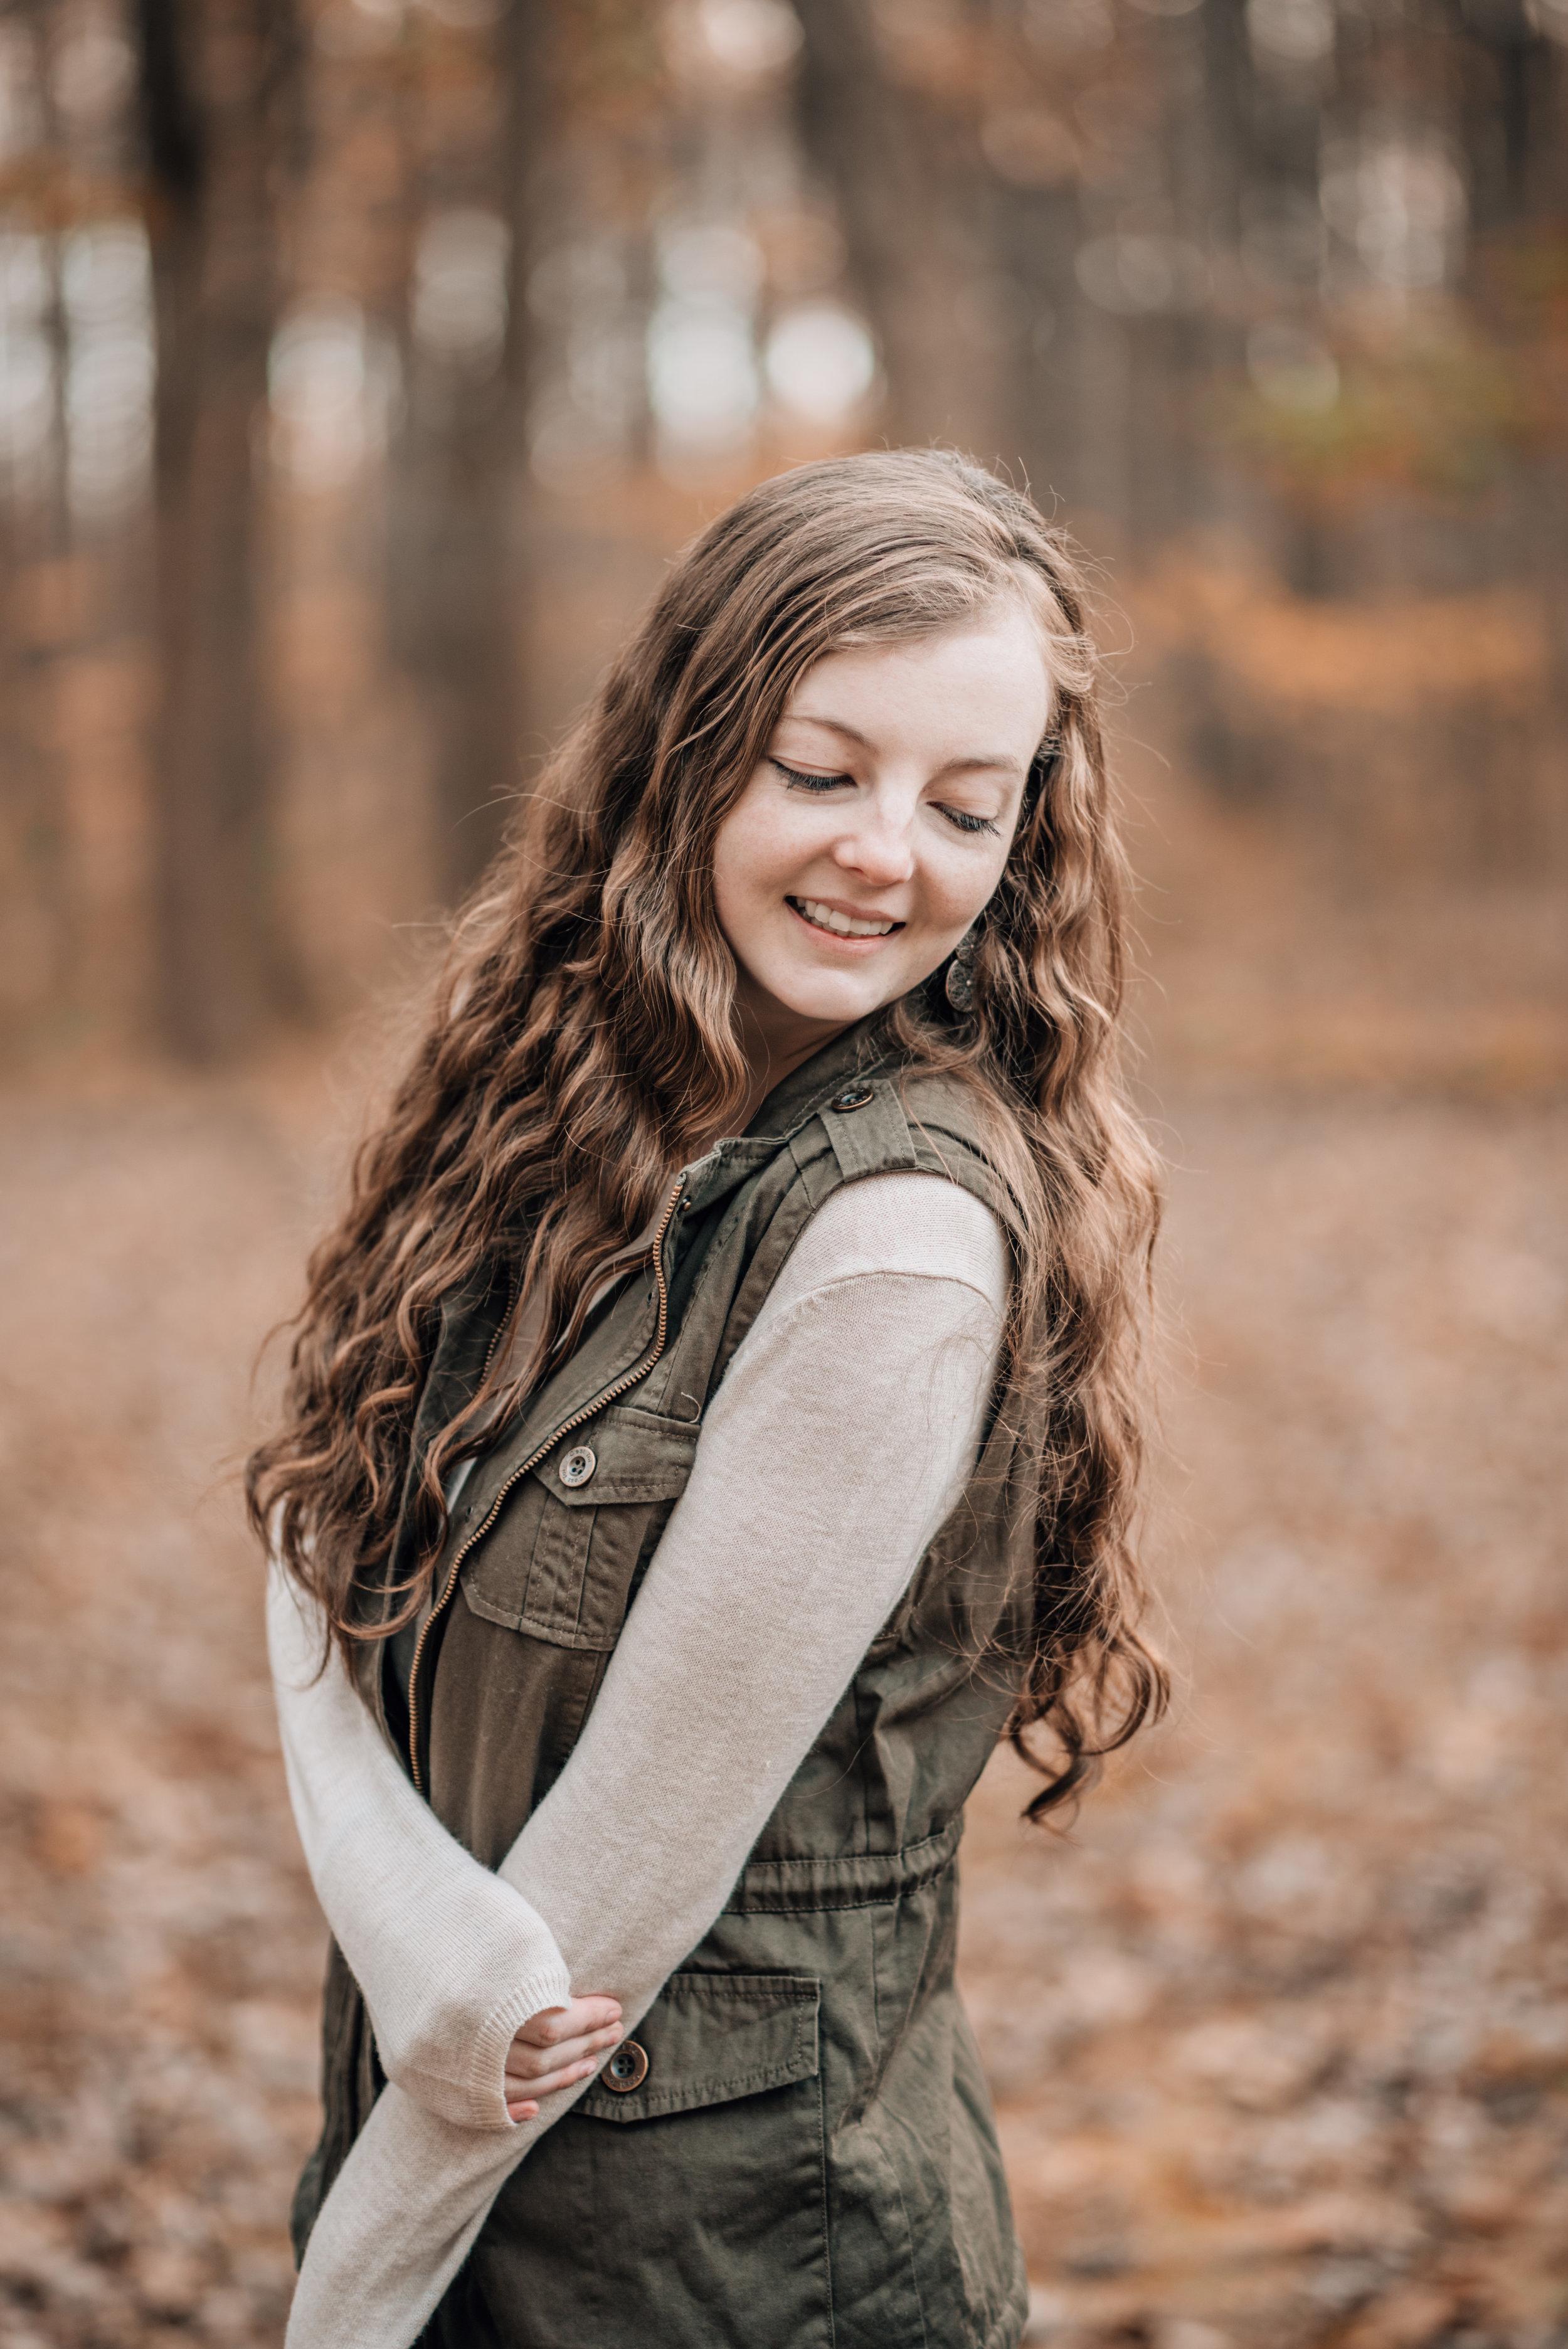 - Becca Mathews: Maryland Senior Portrait, Equine, and Couples Photographer